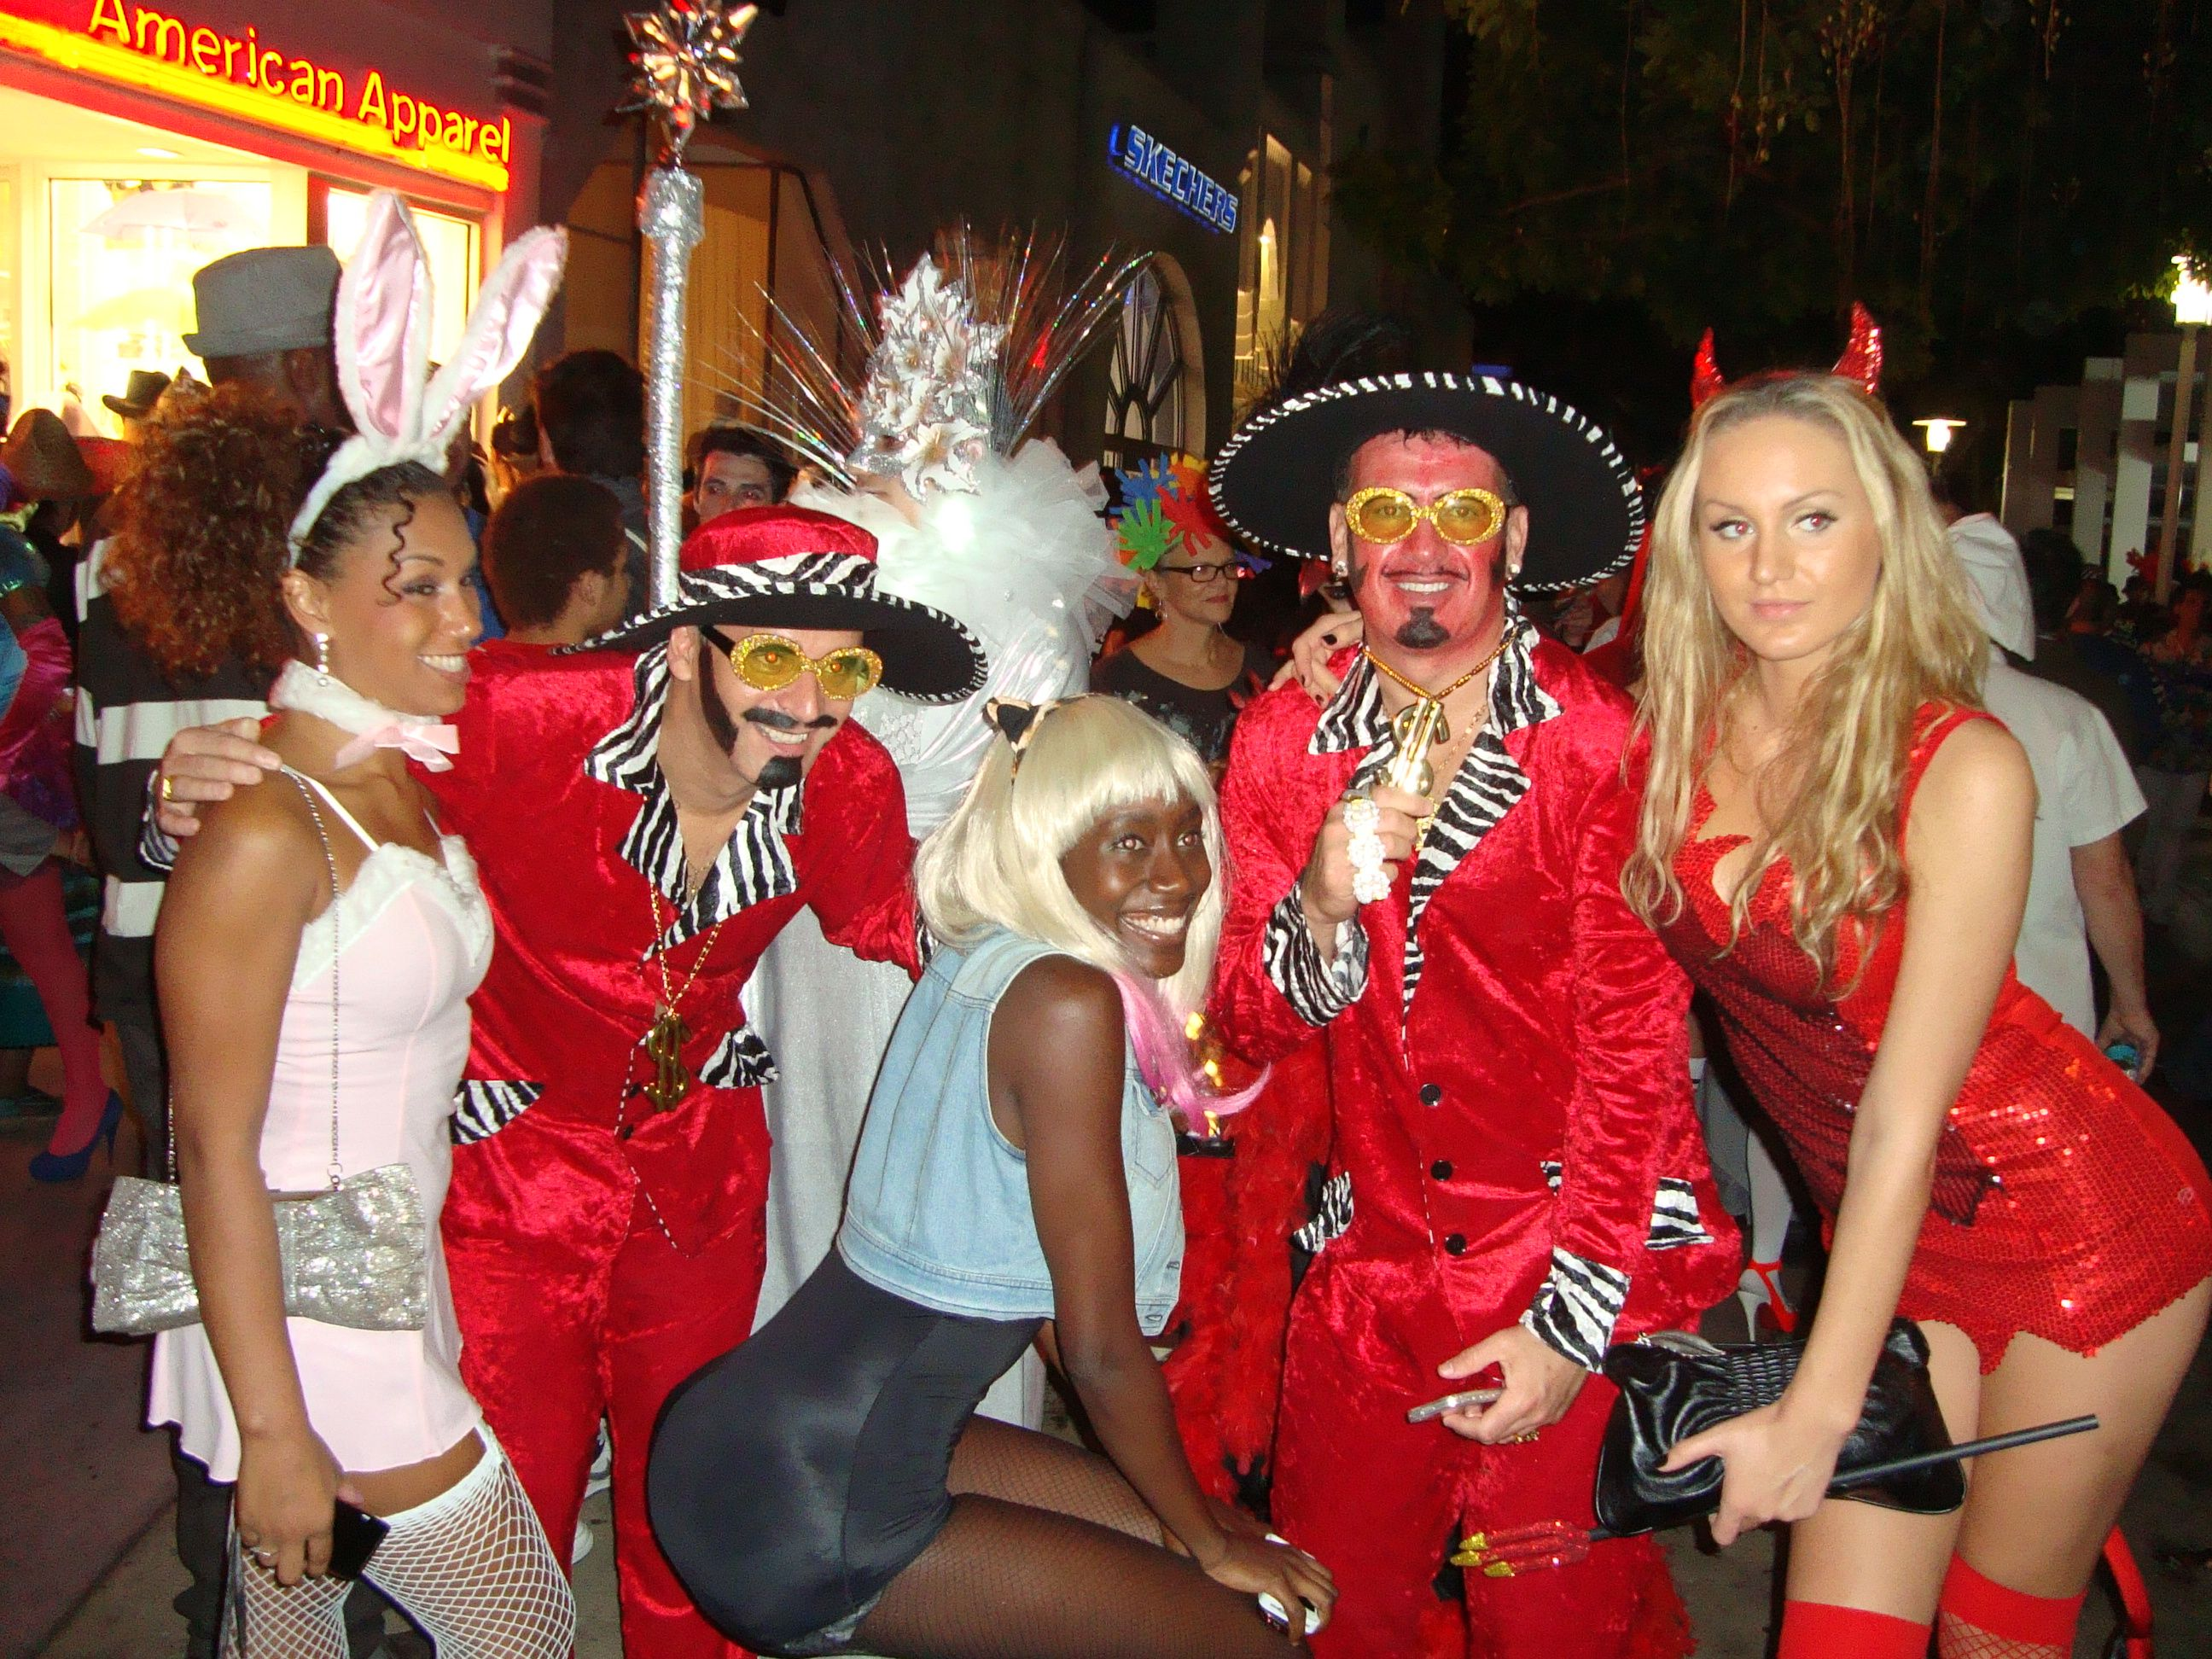 Lincoln Rd Halloween Party, Miami Beach FL | Why I Love Miami ...